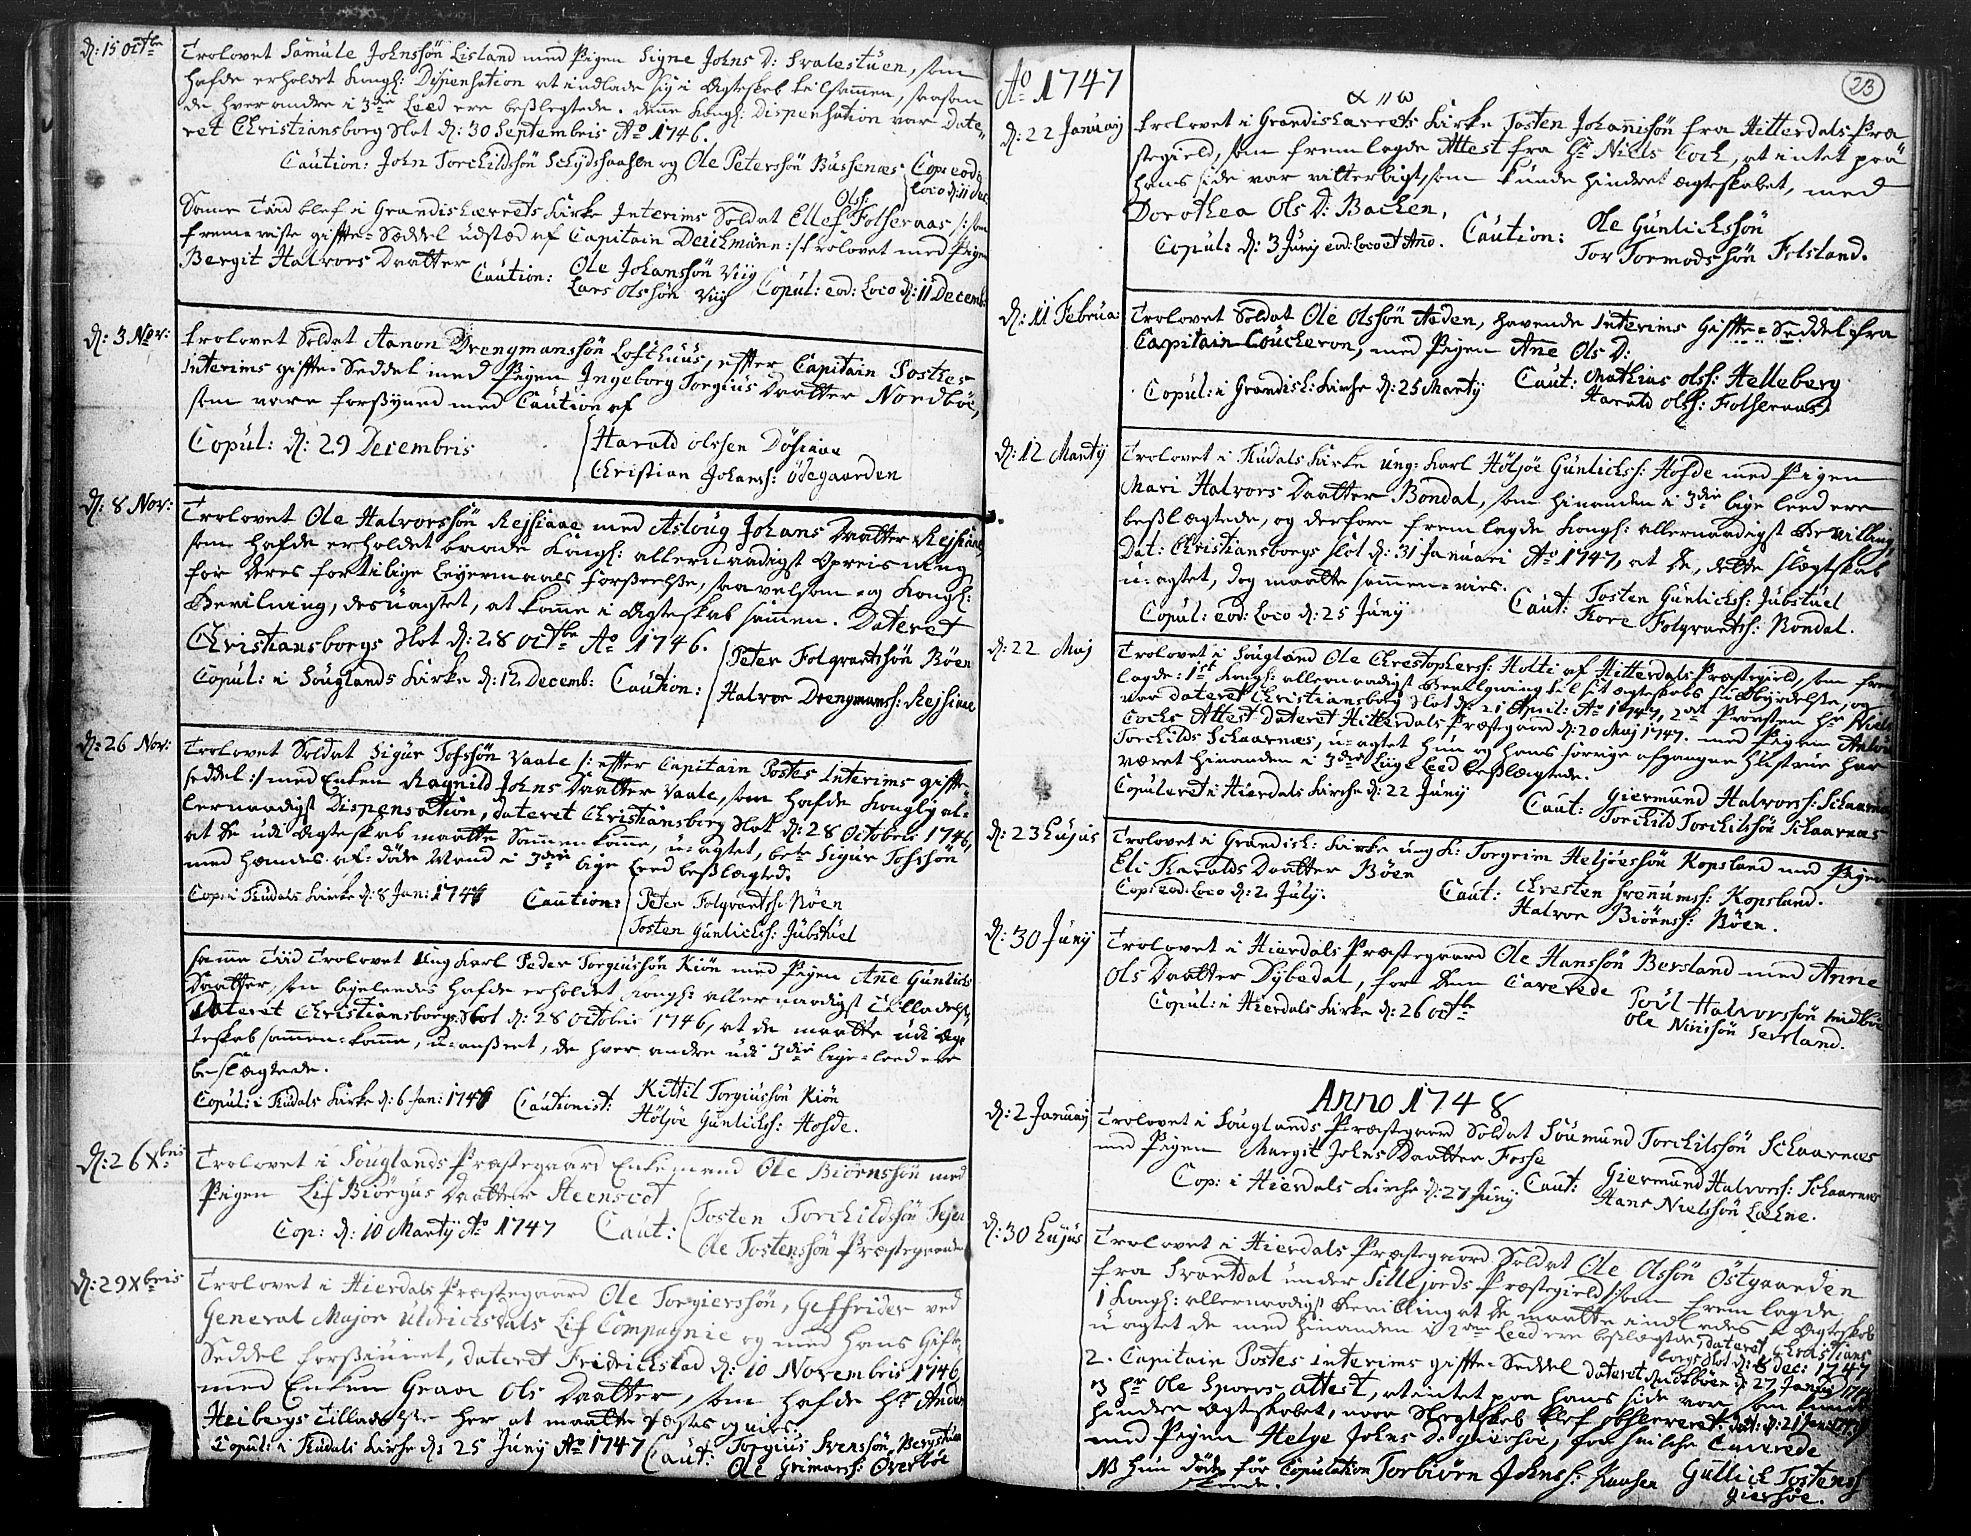 SAKO, Hjartdal kirkebøker, F/Fa/L0004: Ministerialbok nr. I 4, 1727-1795, s. 23